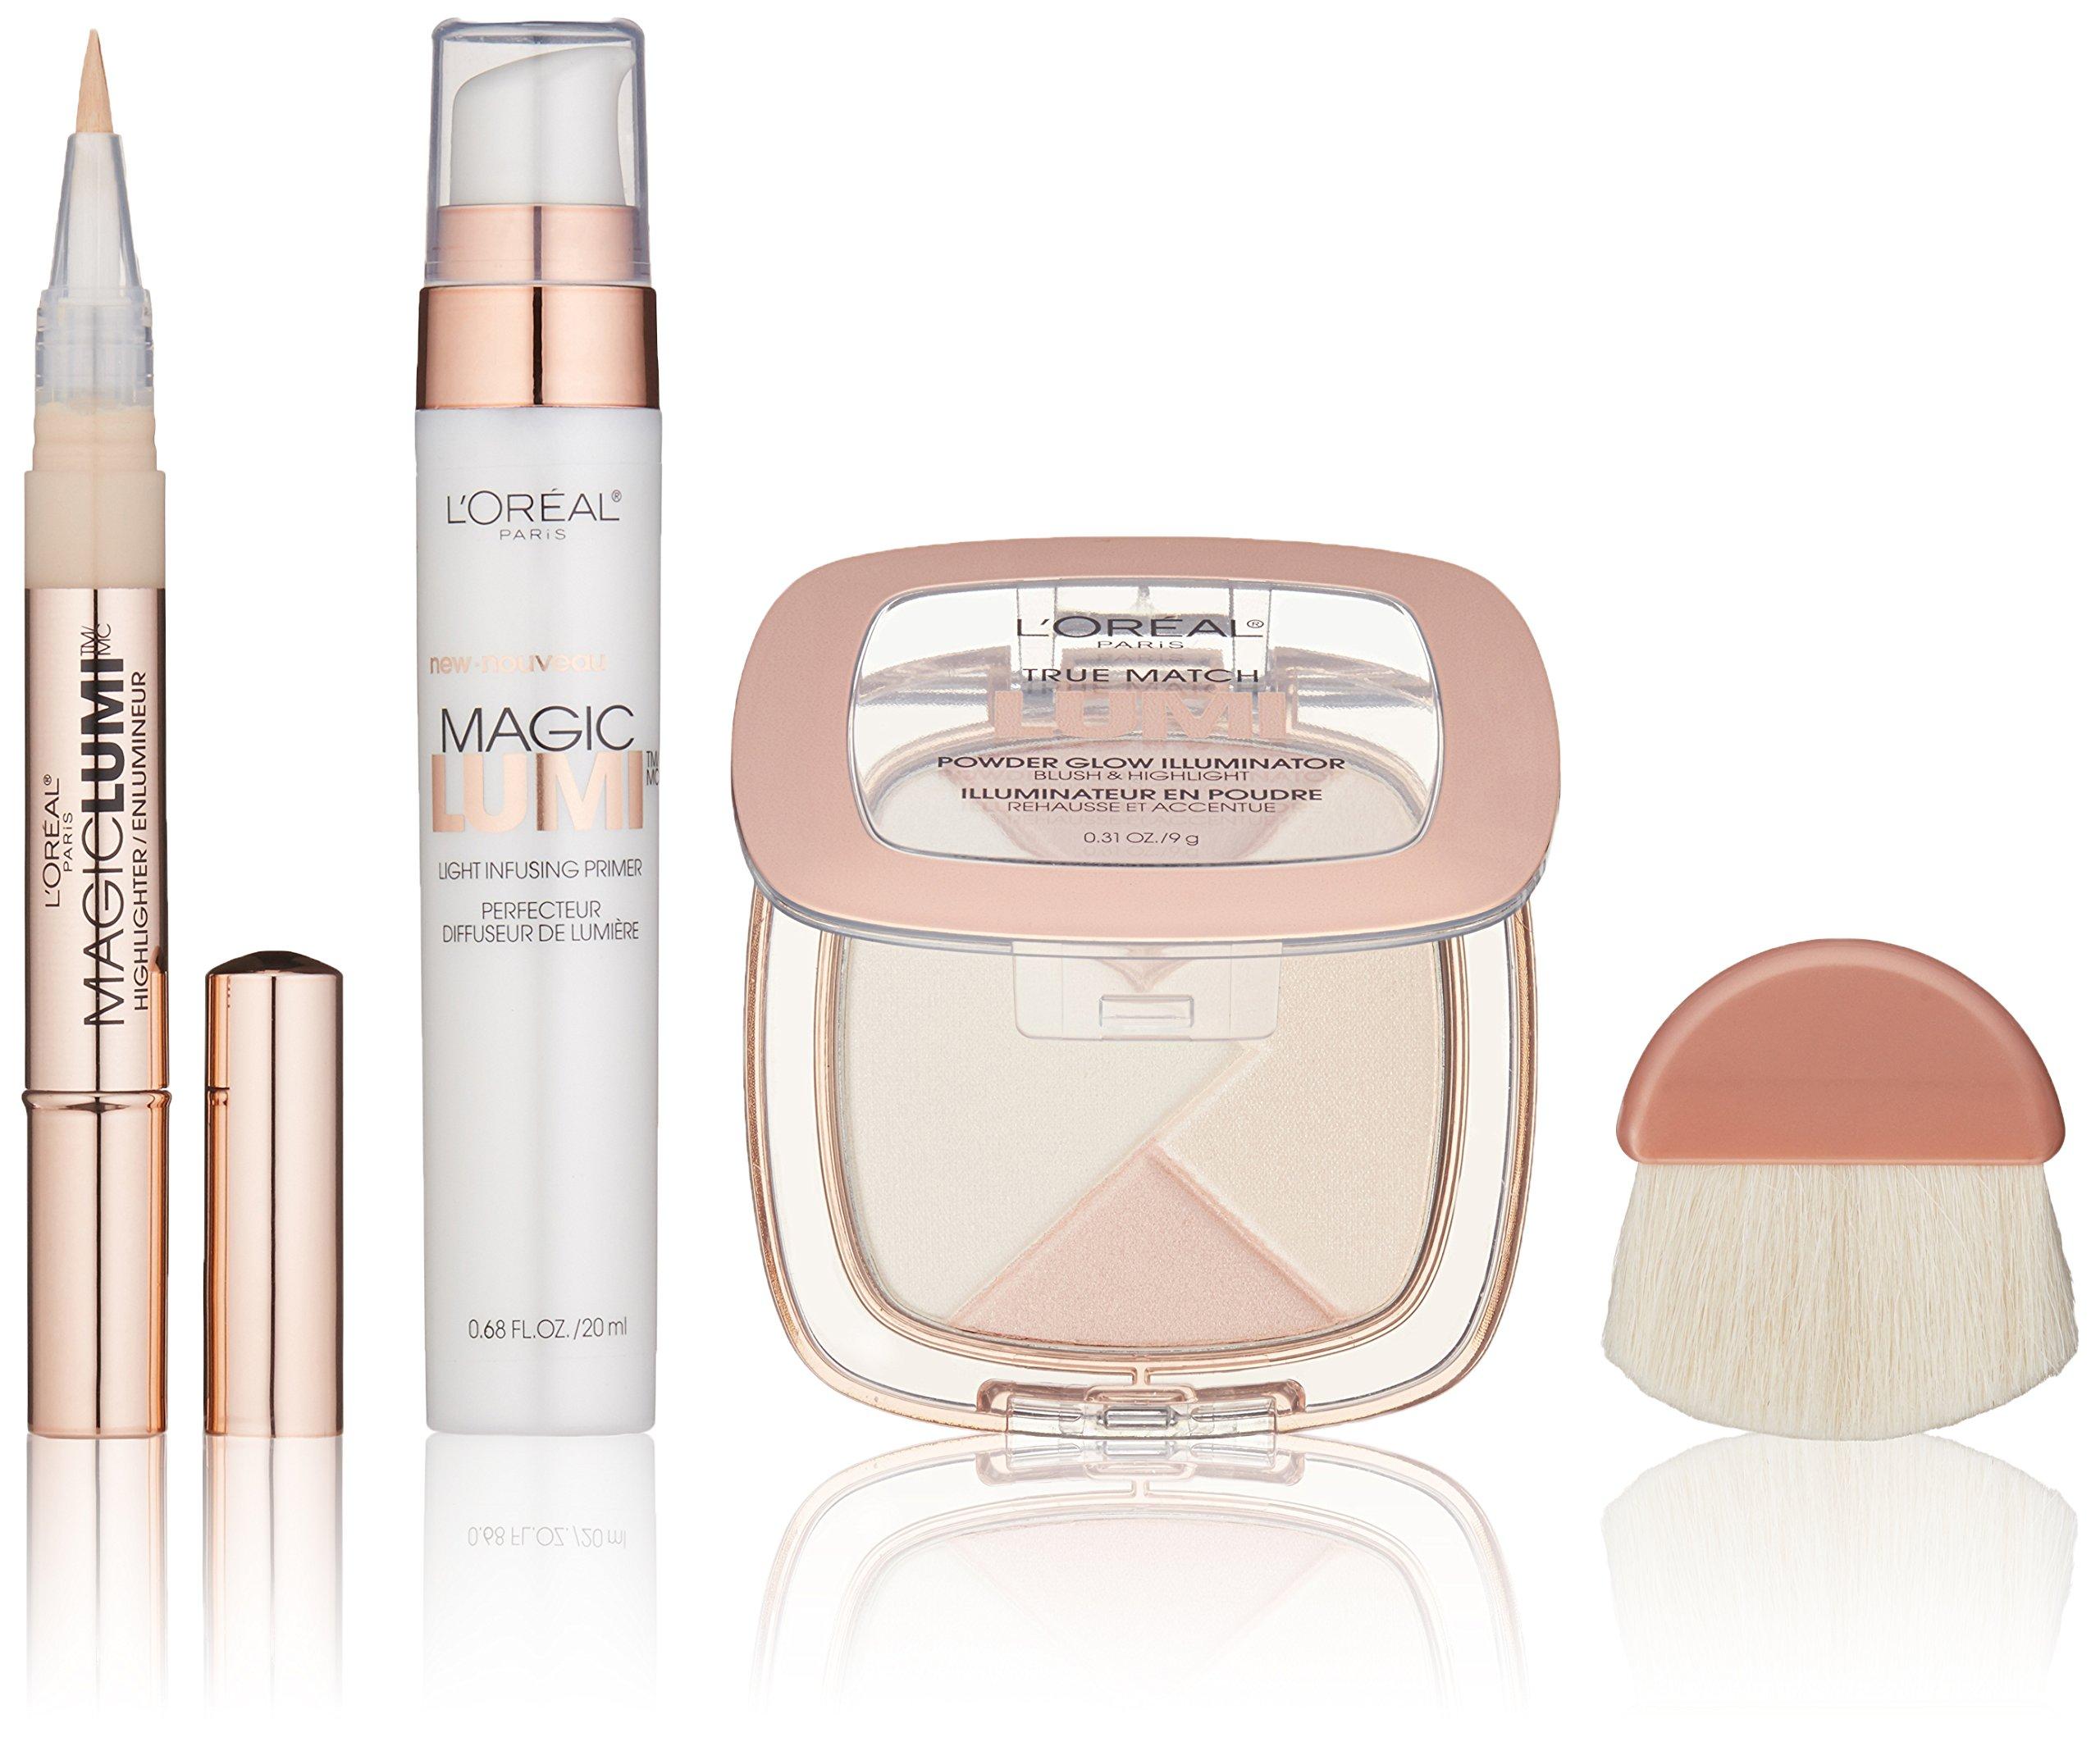 L'Oréal Paris Makeup True Match Lumi Glow Face Gift Set, 3 Pieces, Magic Lumi Primer, Magic Lumi Highlighting Concealer in Light, and True Match Lumi Powder Glow Illuminator in Neutral